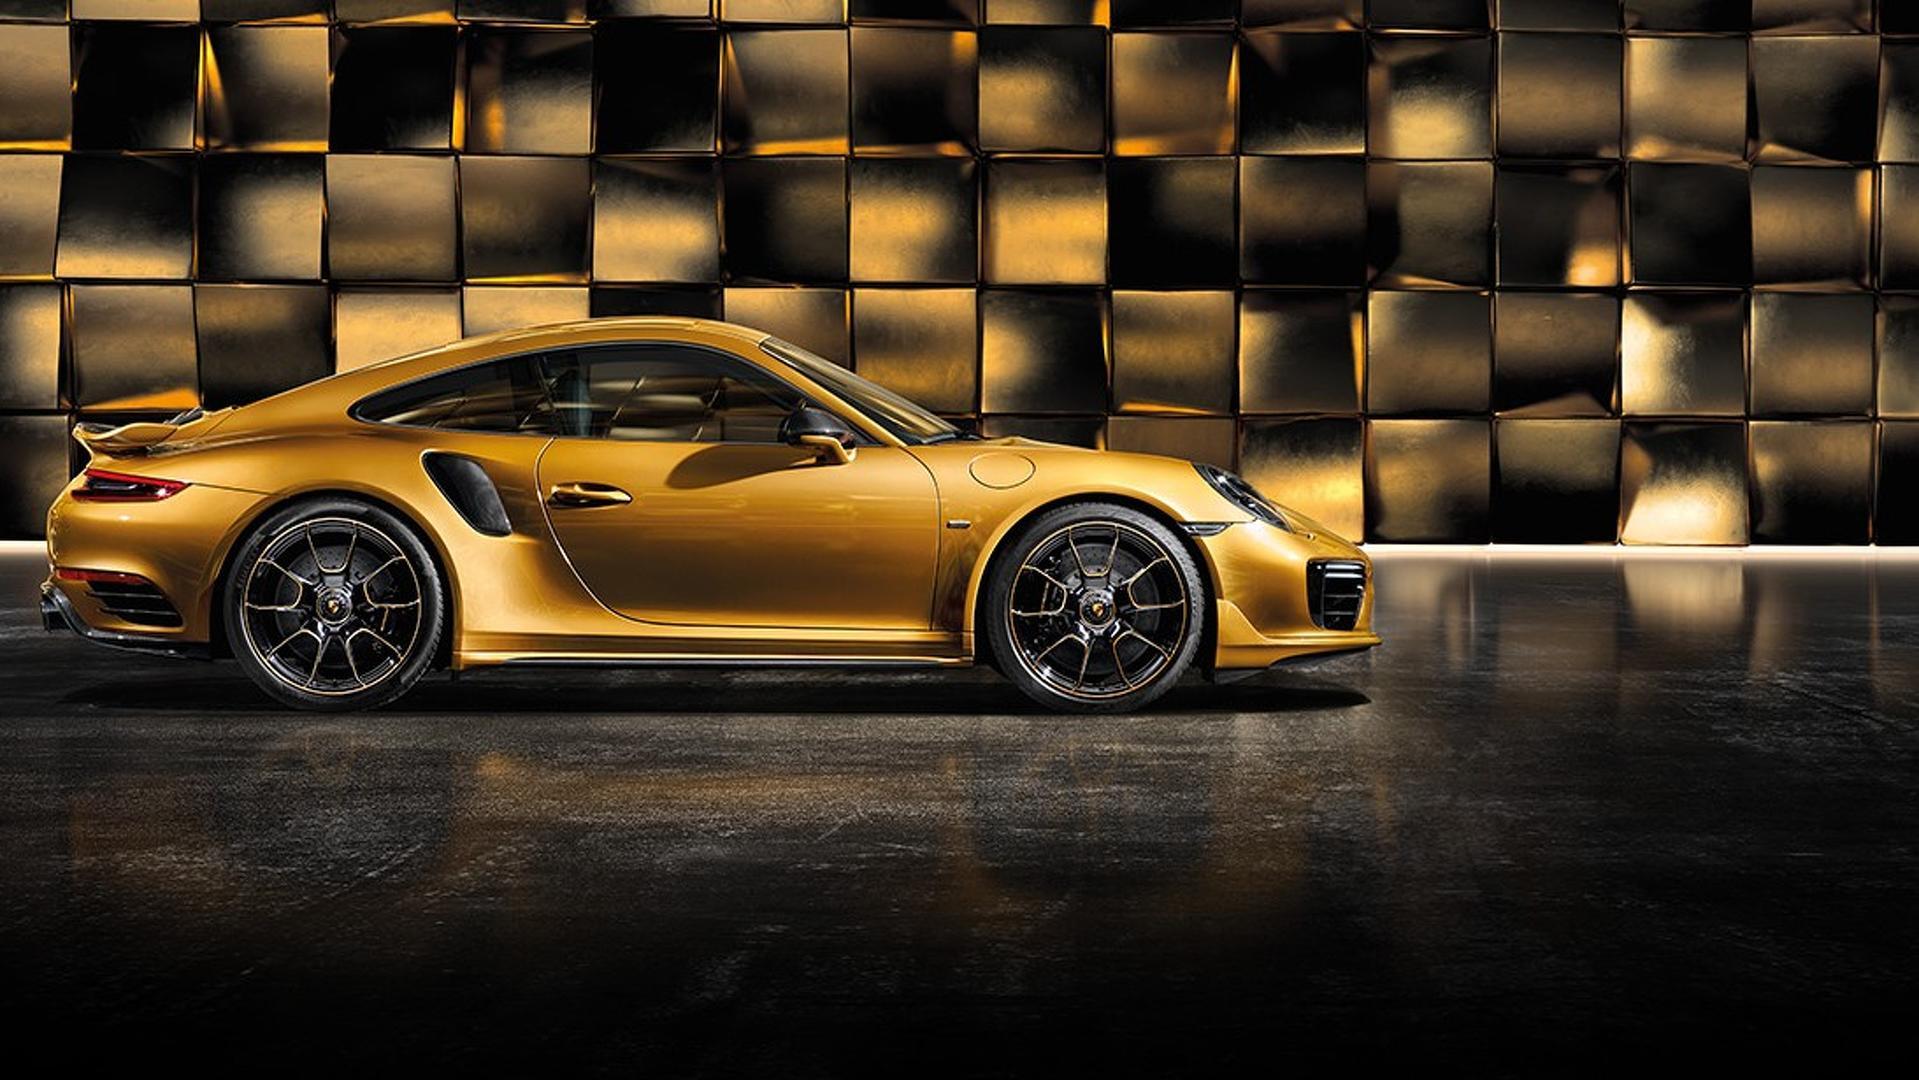 Porsche_911_Turbo_S_Exclusive_Series_06